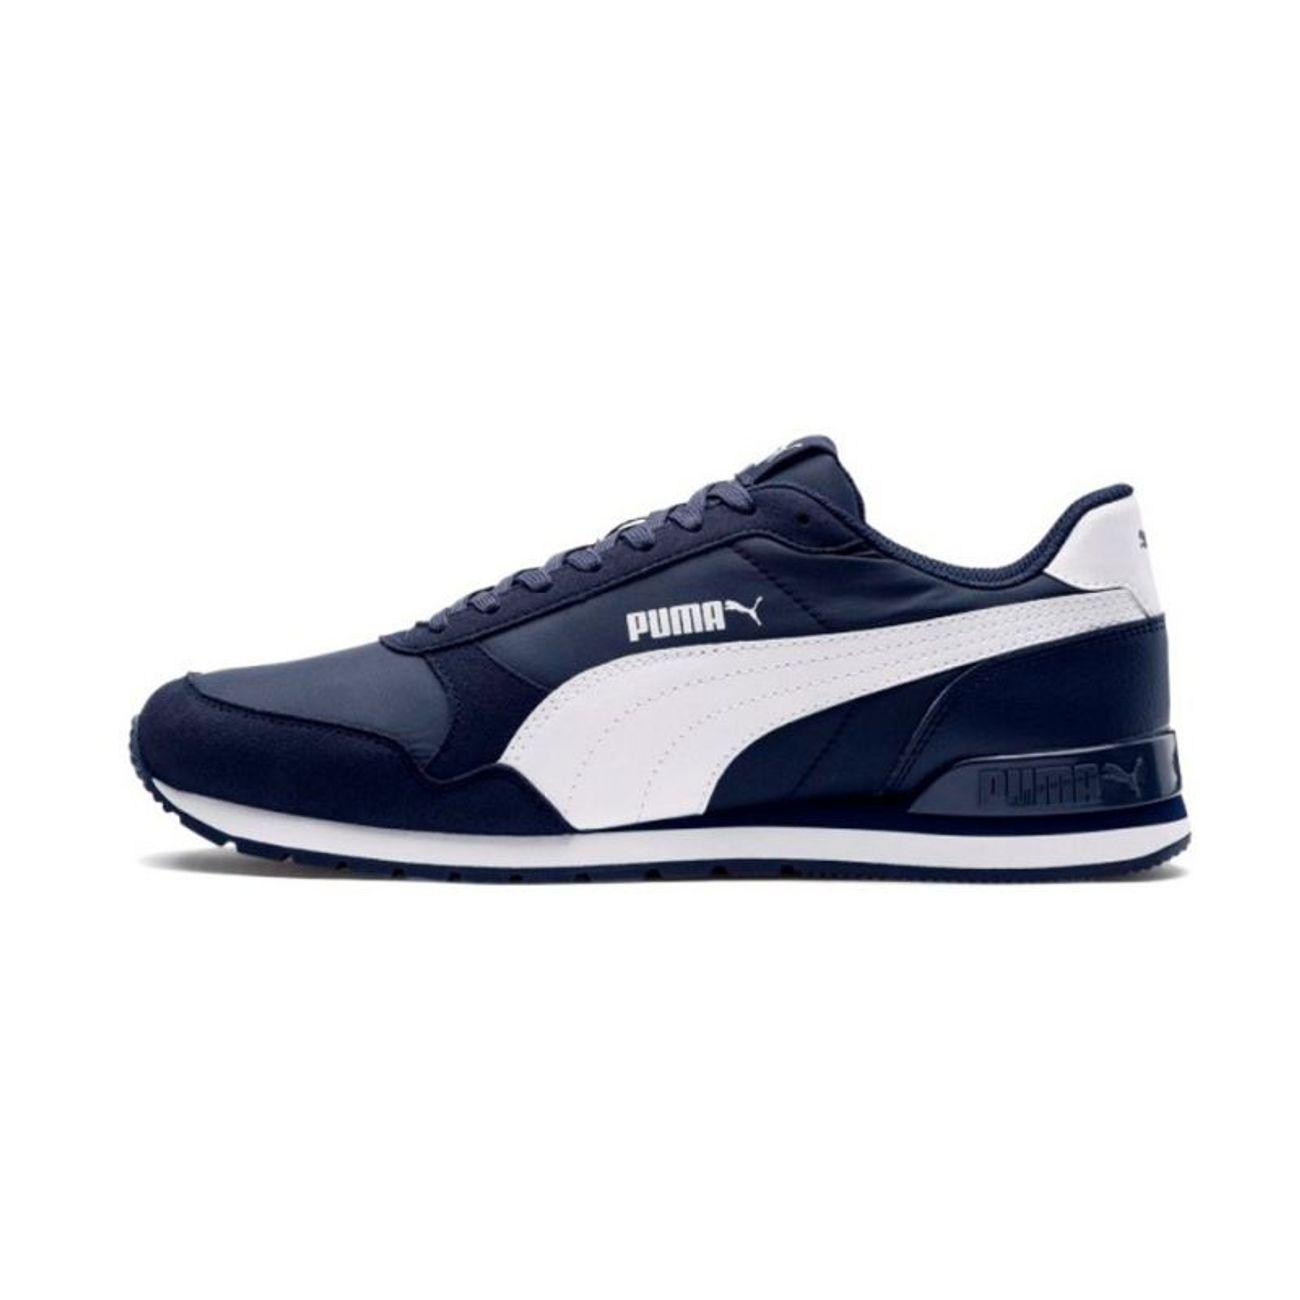 Padel Runner Bleu Puma 365278 Nl Adulte 08 St V2 Marine dxeBroC